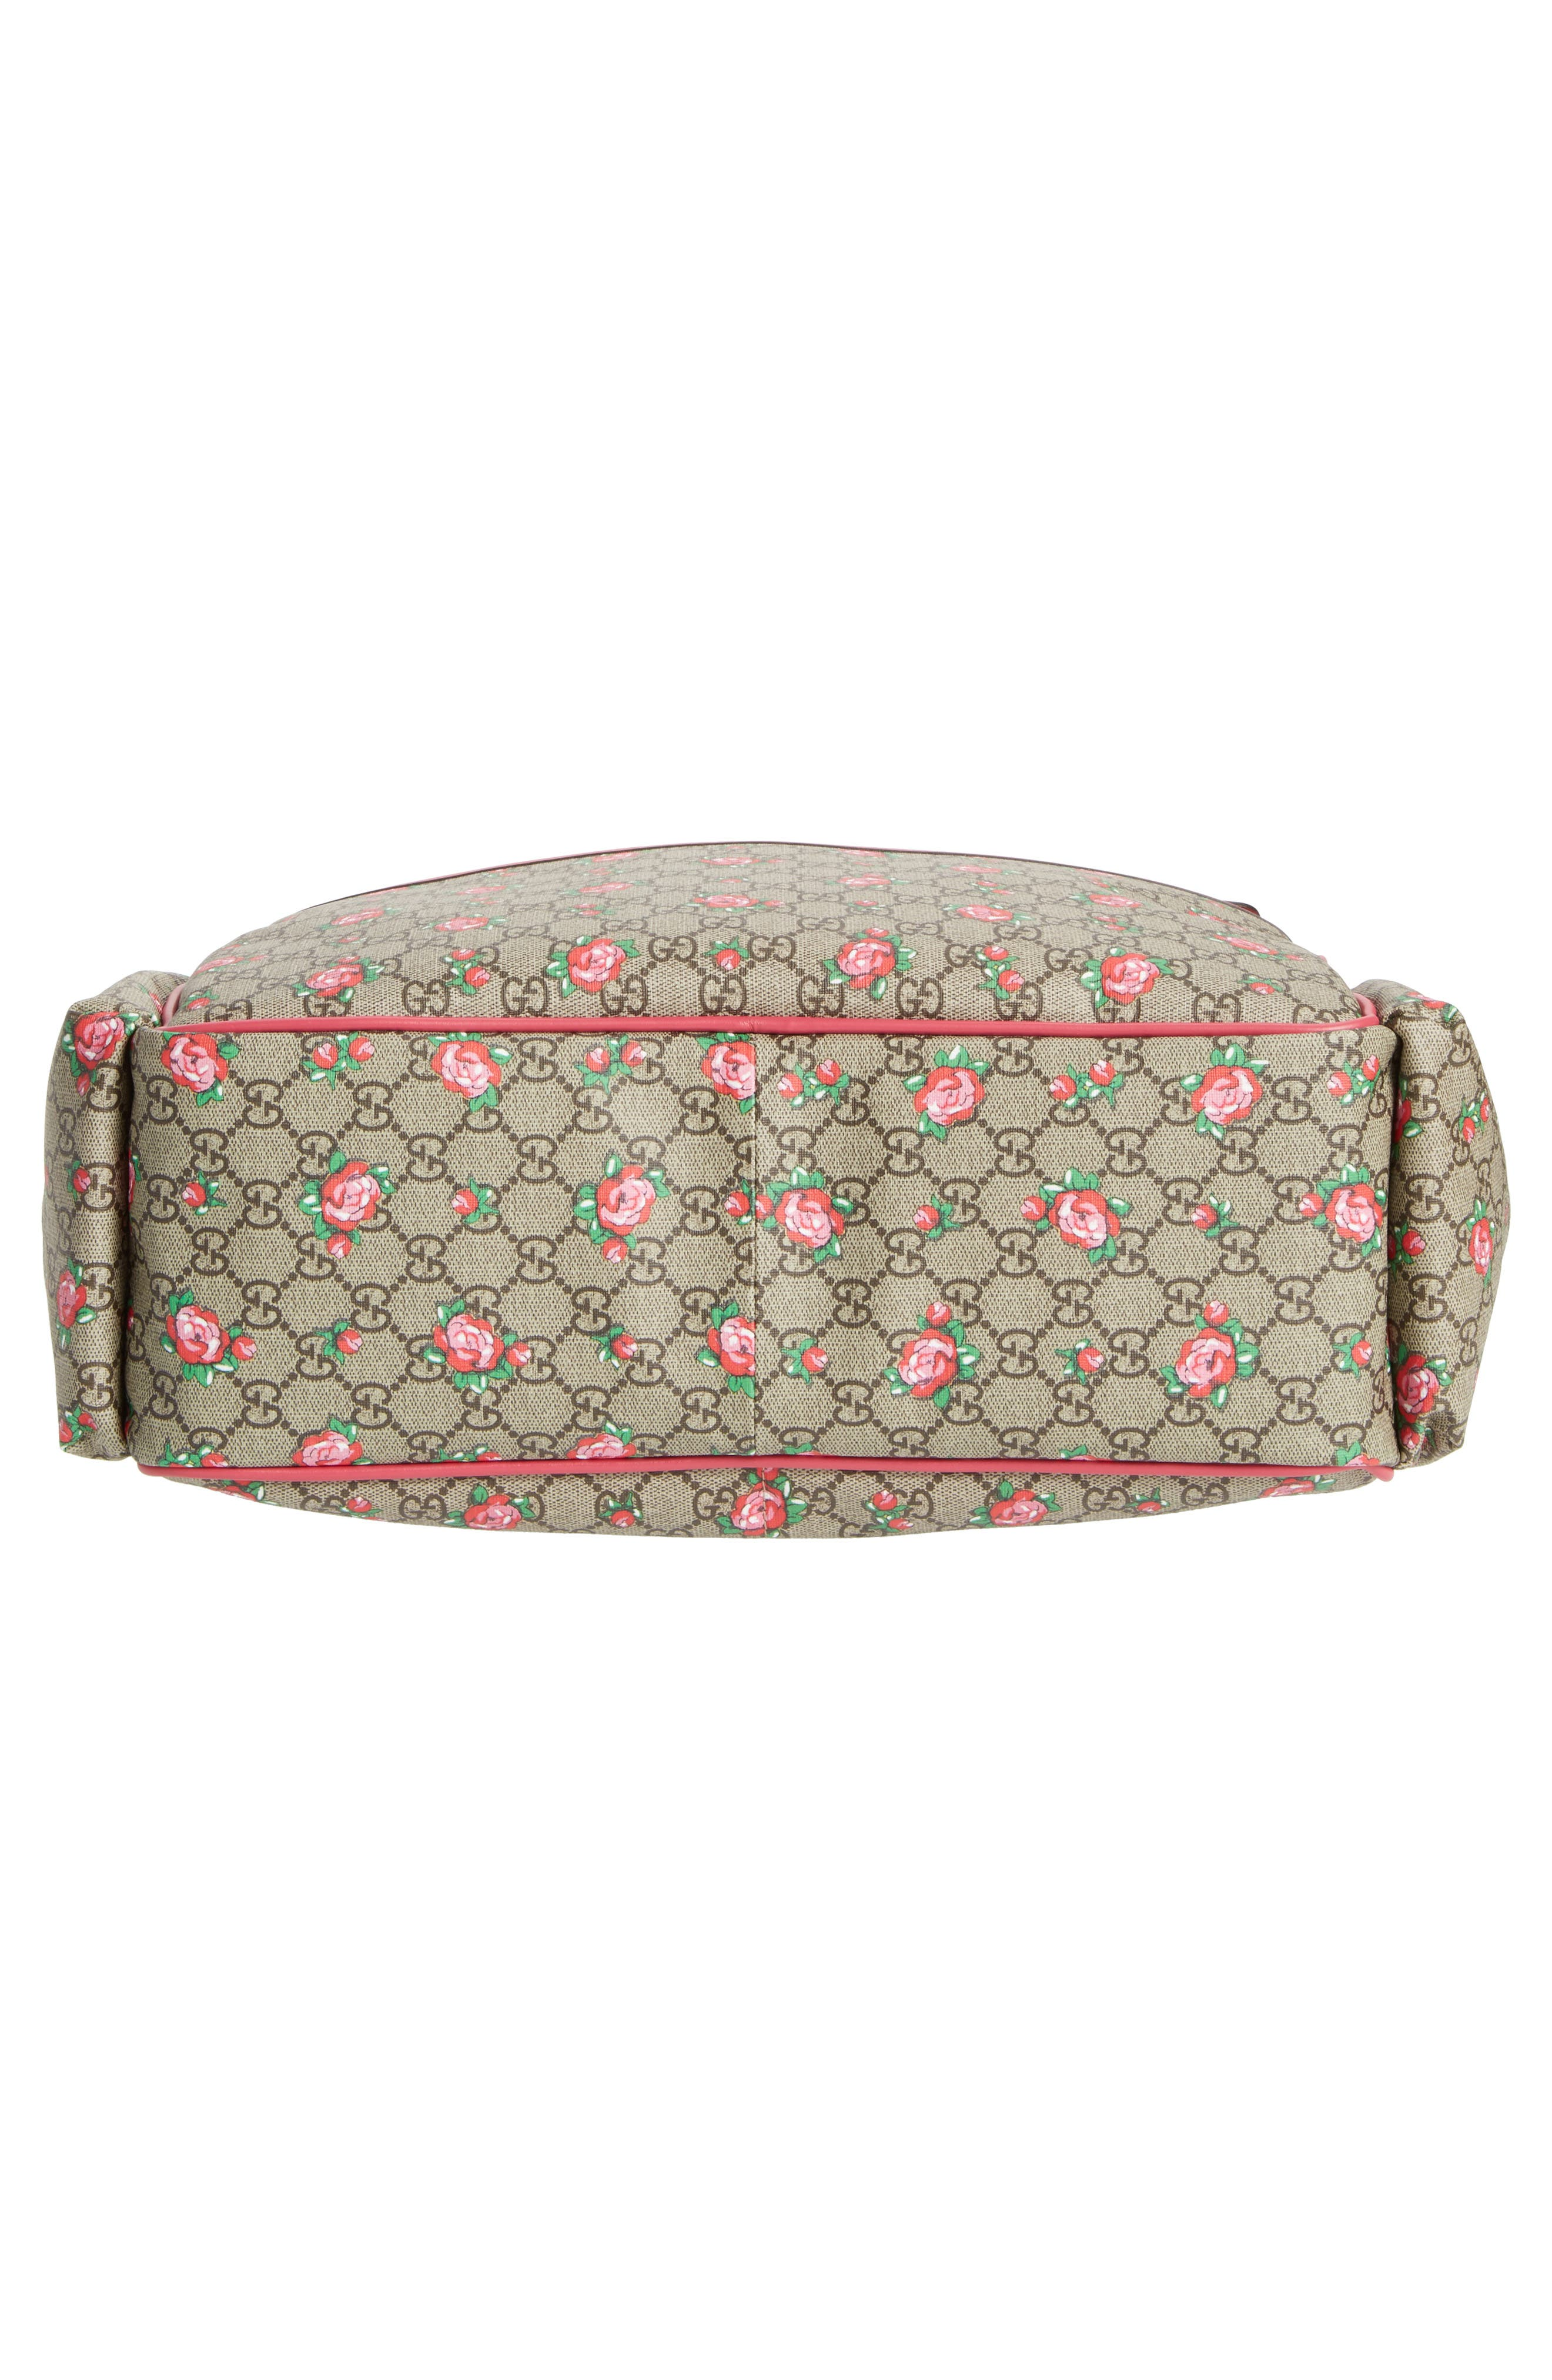 Rose Bud GG Supreme Diaper Bag,                             Alternate thumbnail 6, color,